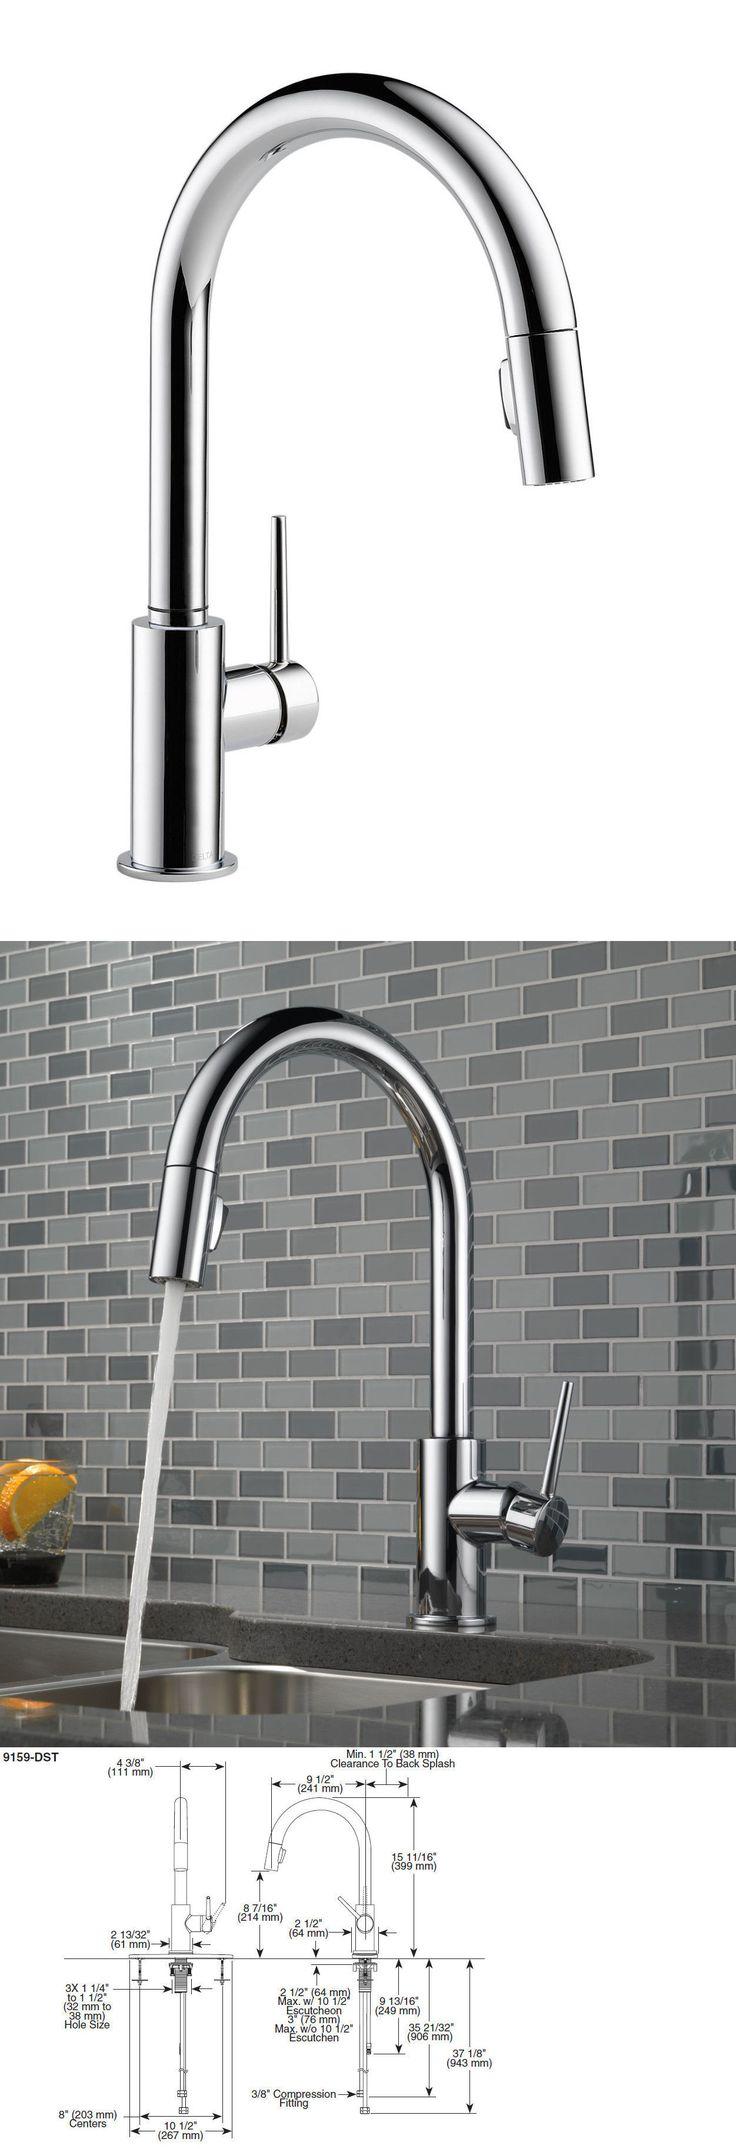 best 25 delta kitchen faucets ideas on pinterest kitchen faucets 42024 delta 9159 dst trinsic single handle pull down kitchen faucet